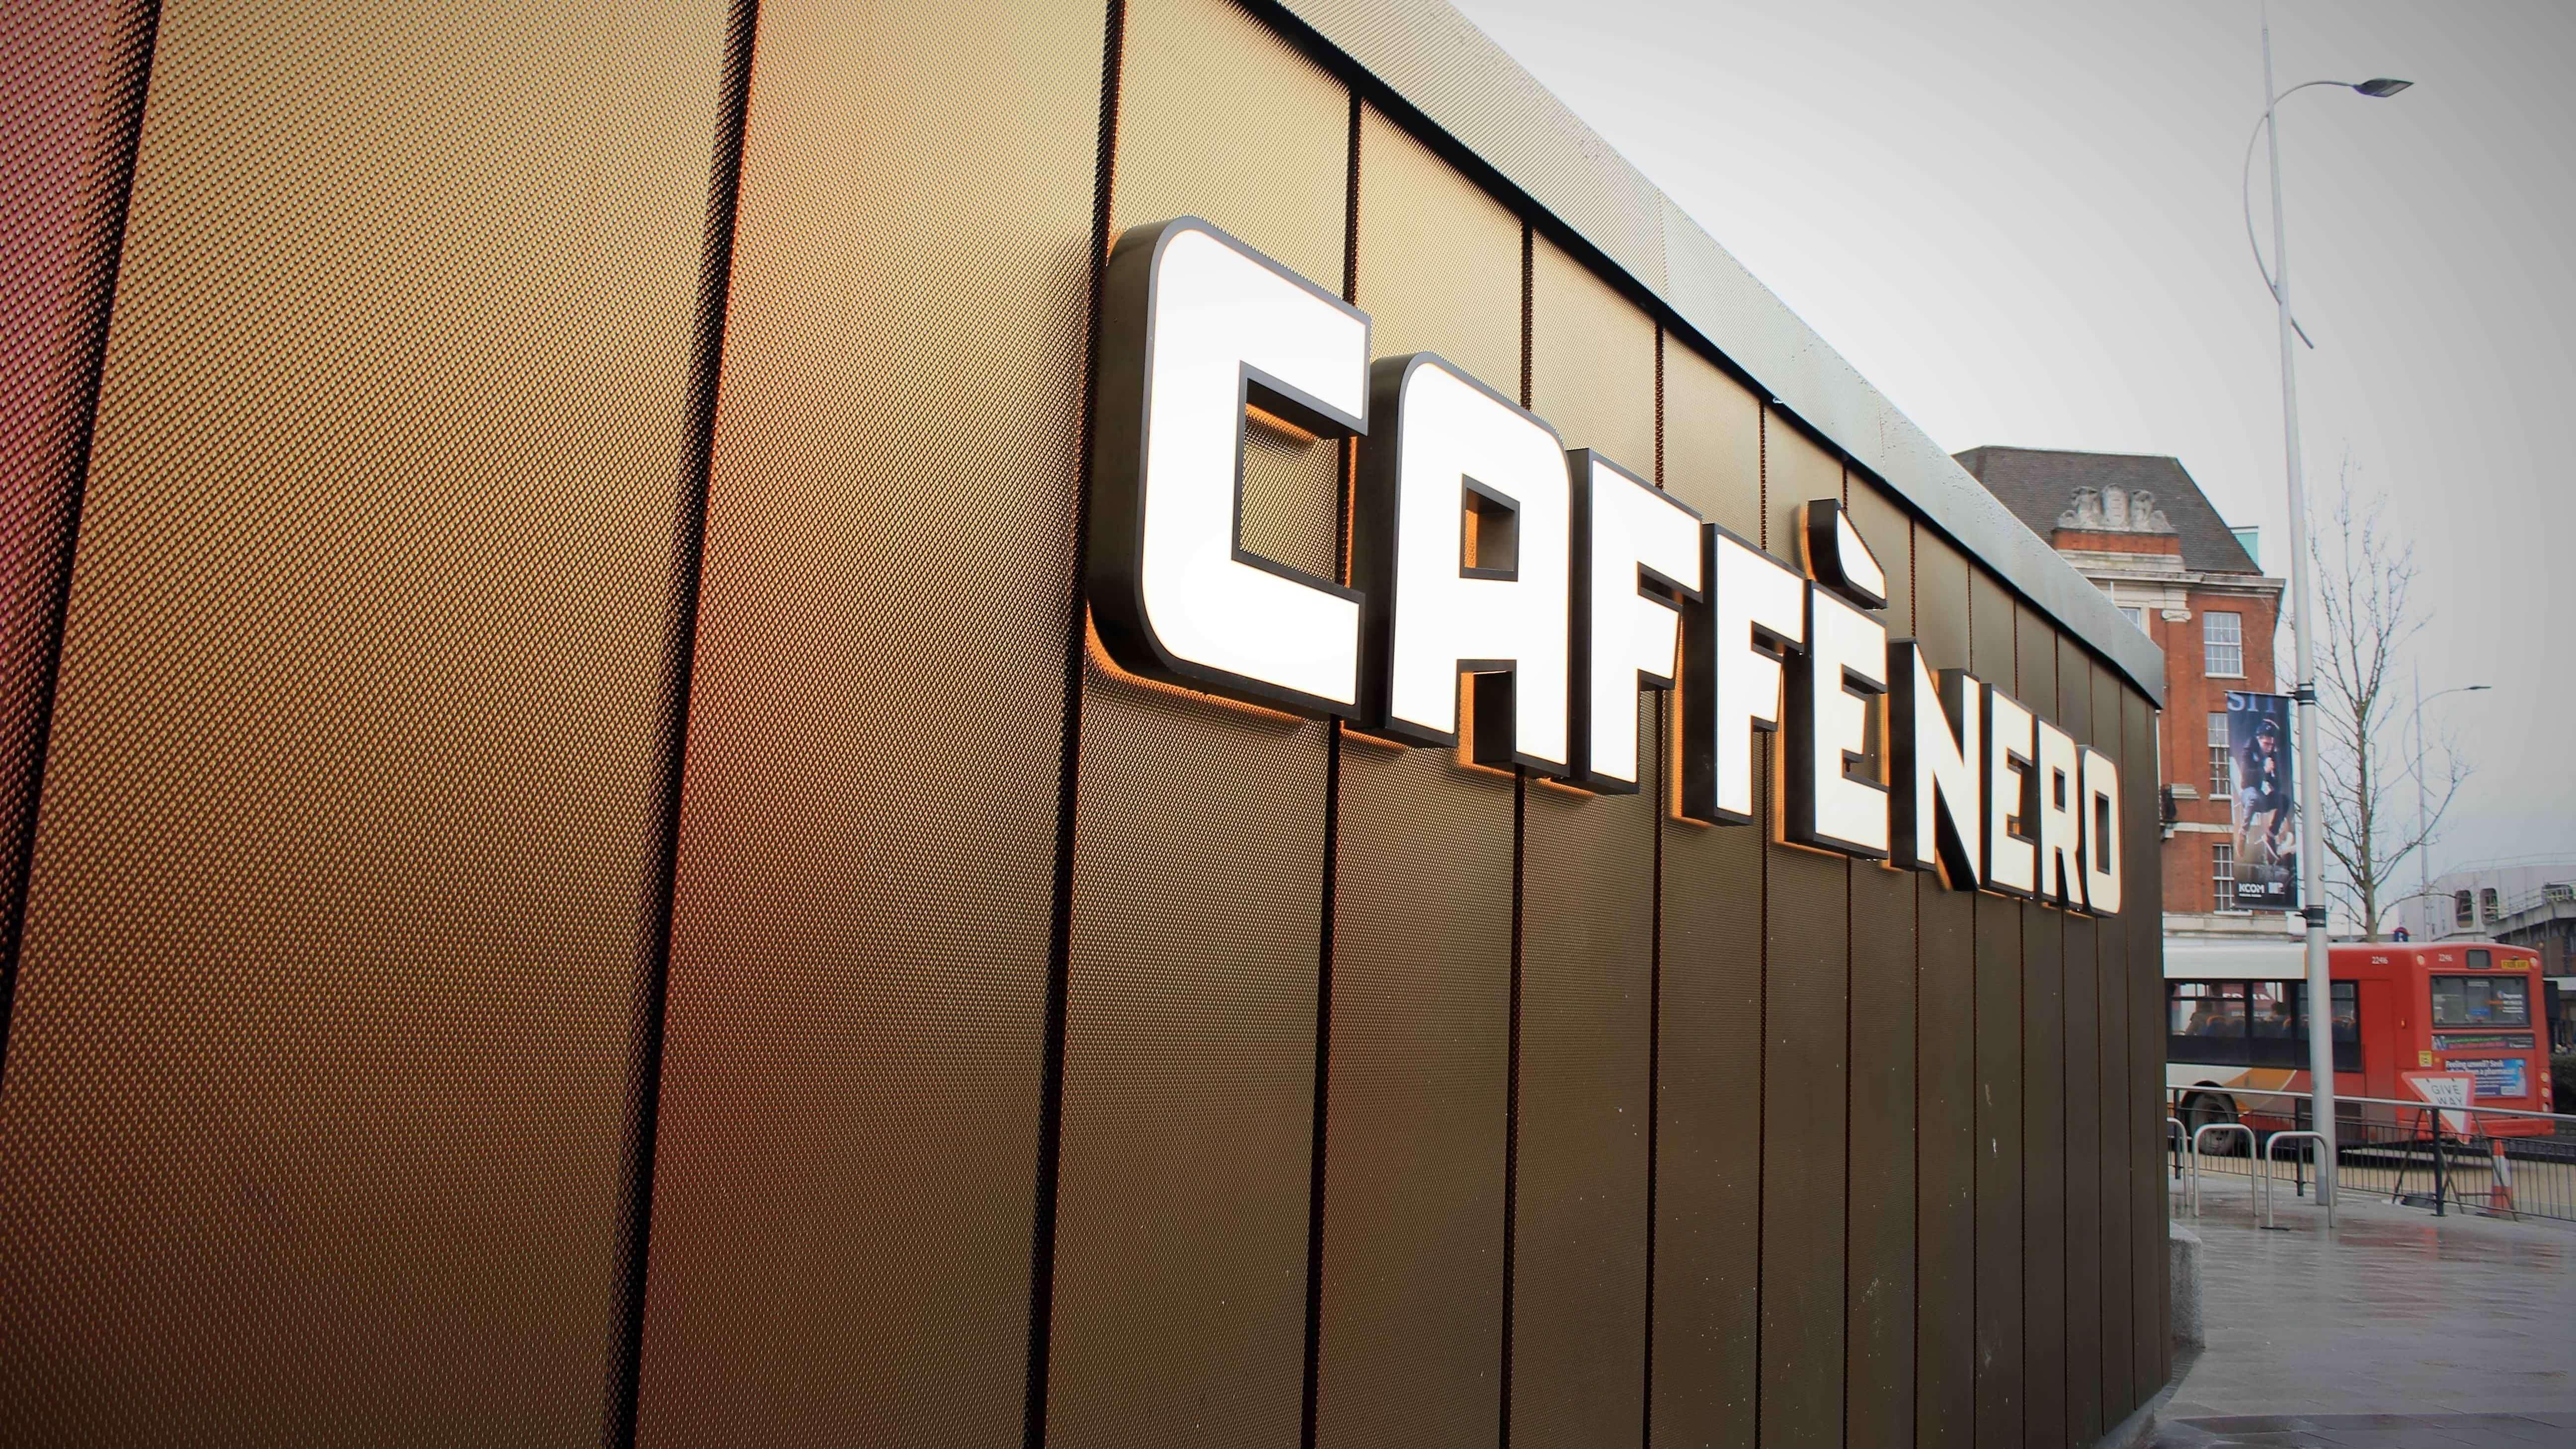 Caffe Nero Hull Longworth Brass Cladding